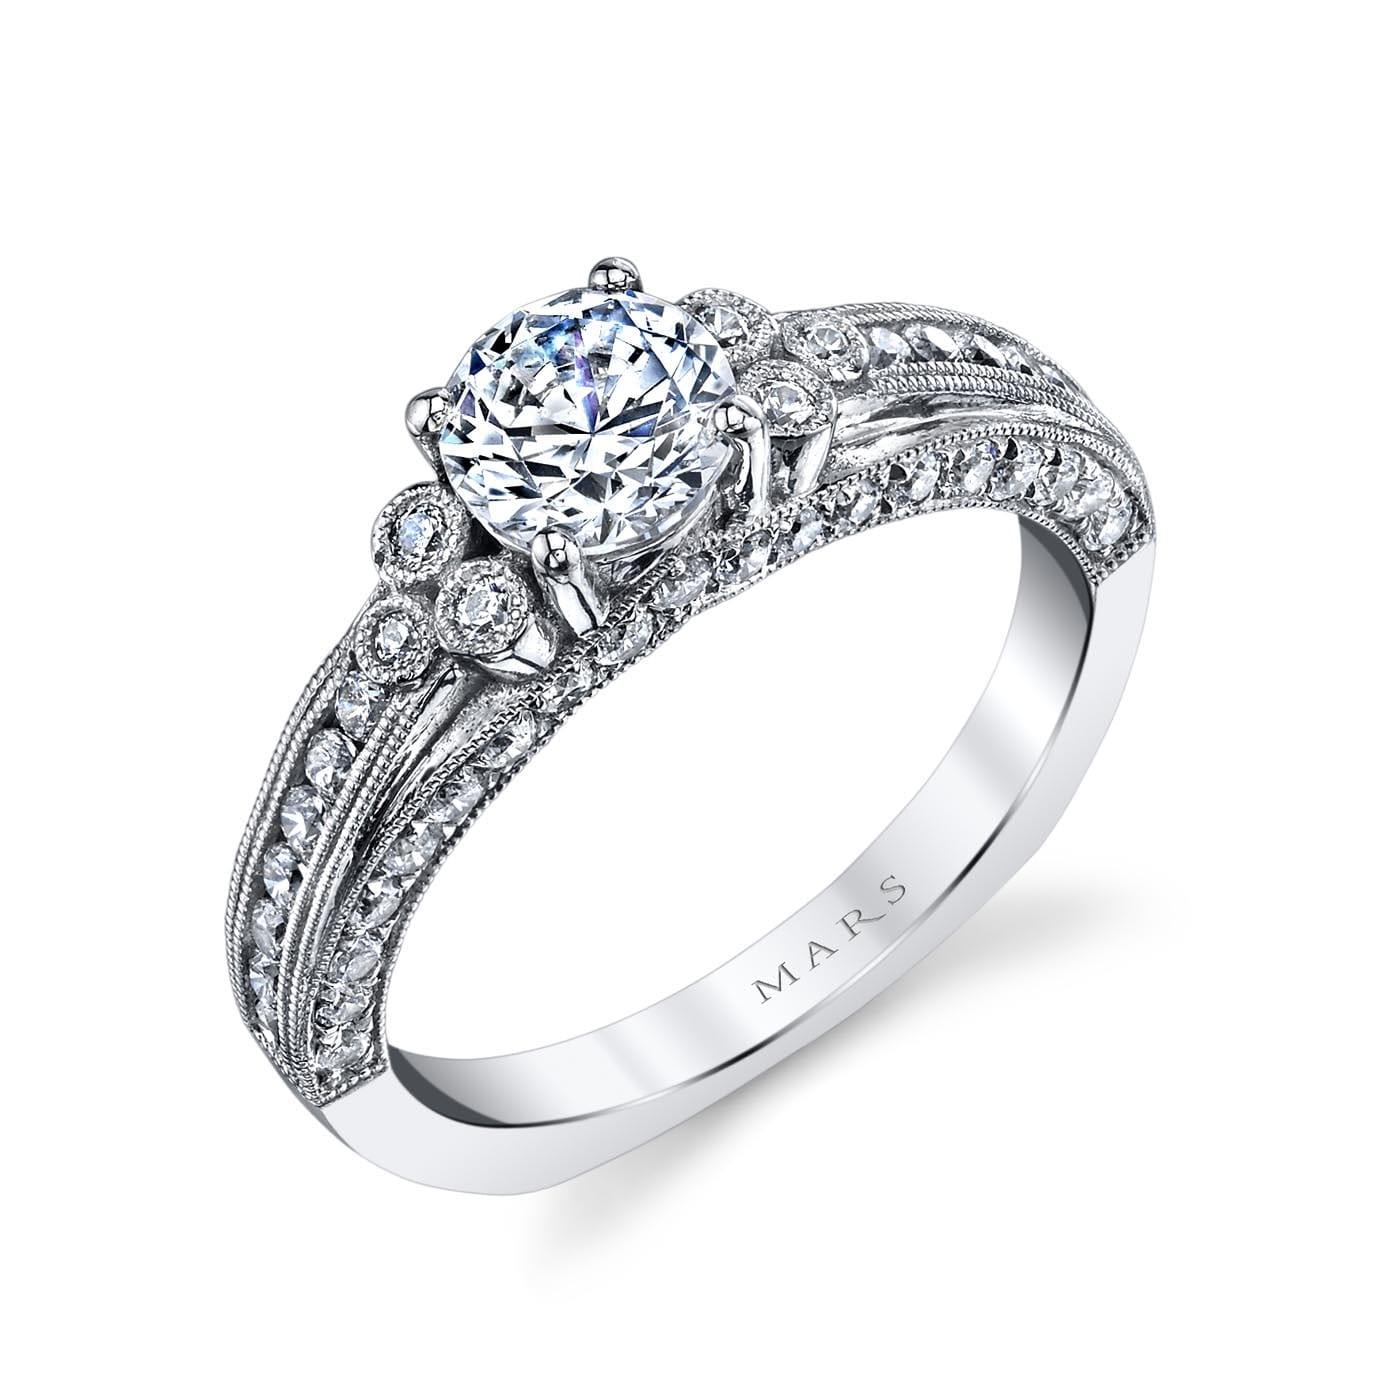 Three_Stone Engagement RingStyle #: MARS 26075